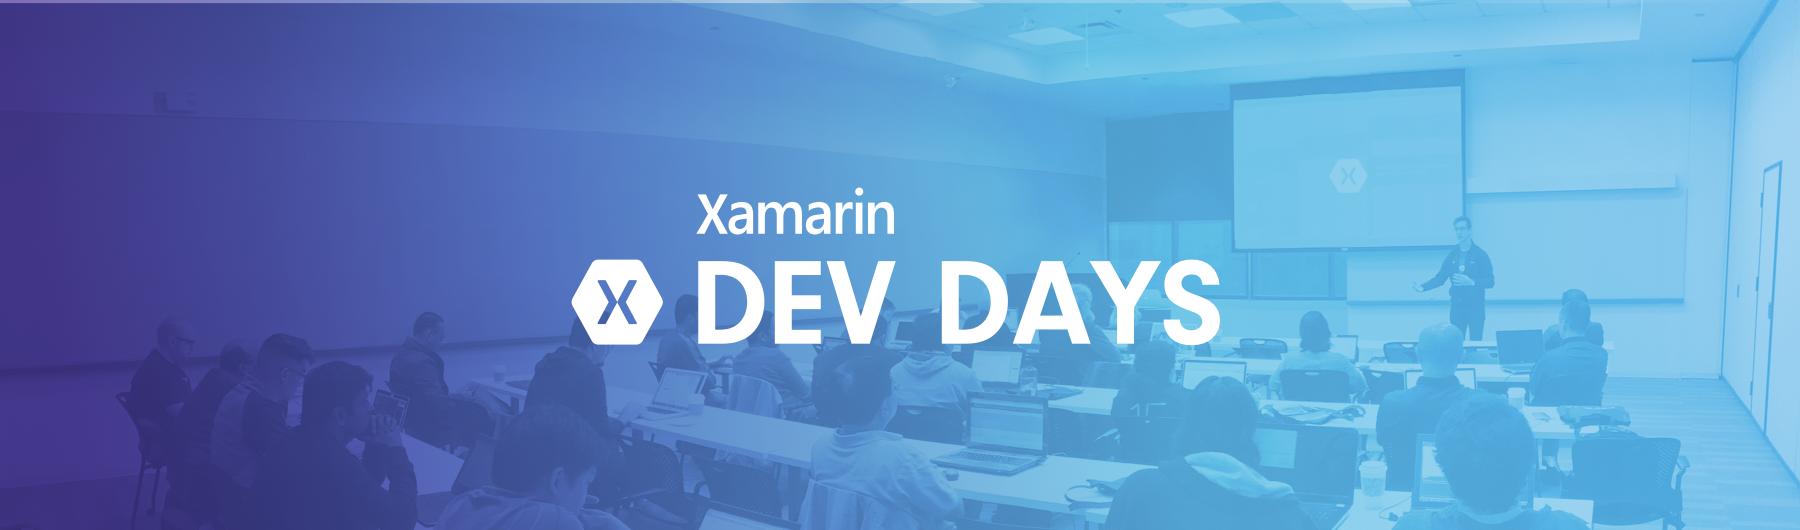 Xamarin Dev Days - Vancouver